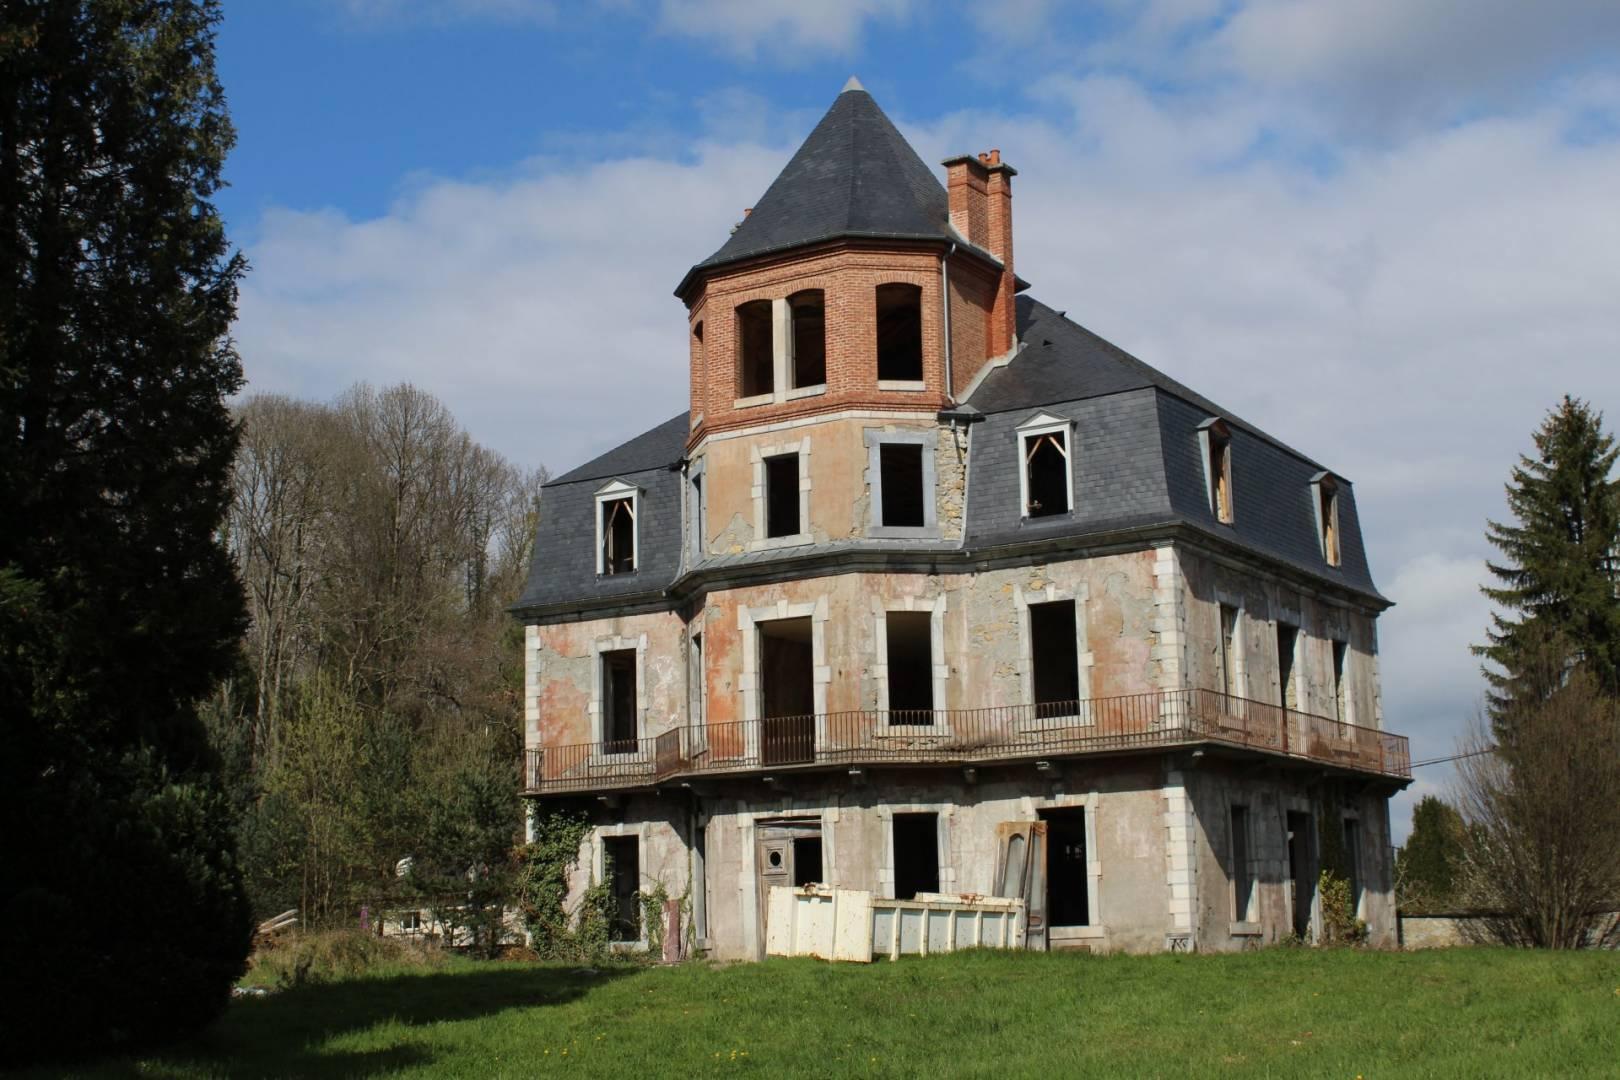 1 10 Bagnères-de-Bigorre